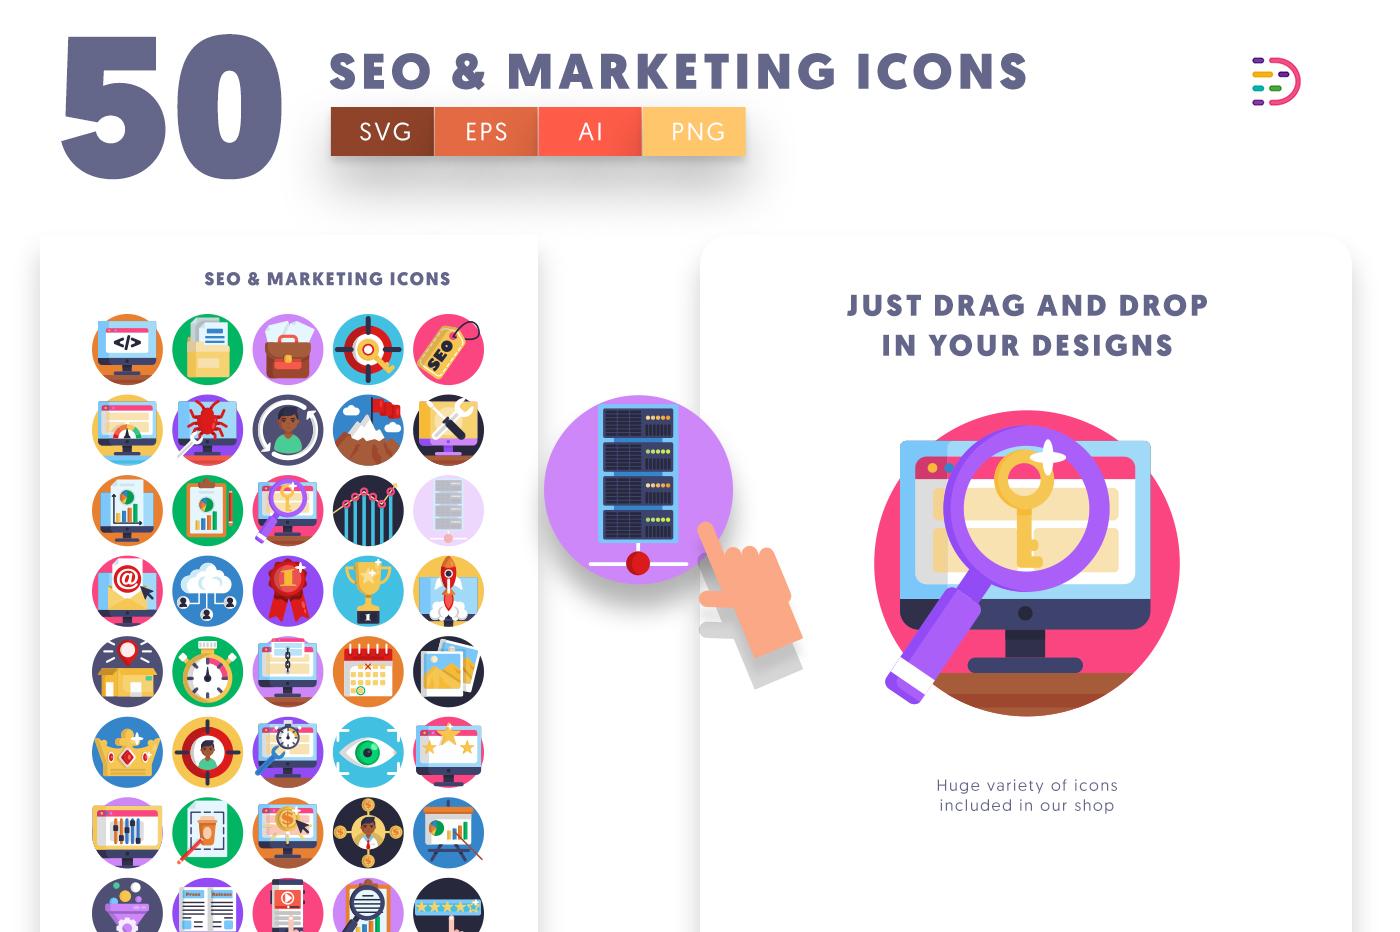 Drag and drop vector 50 Seo & Marketing Icons